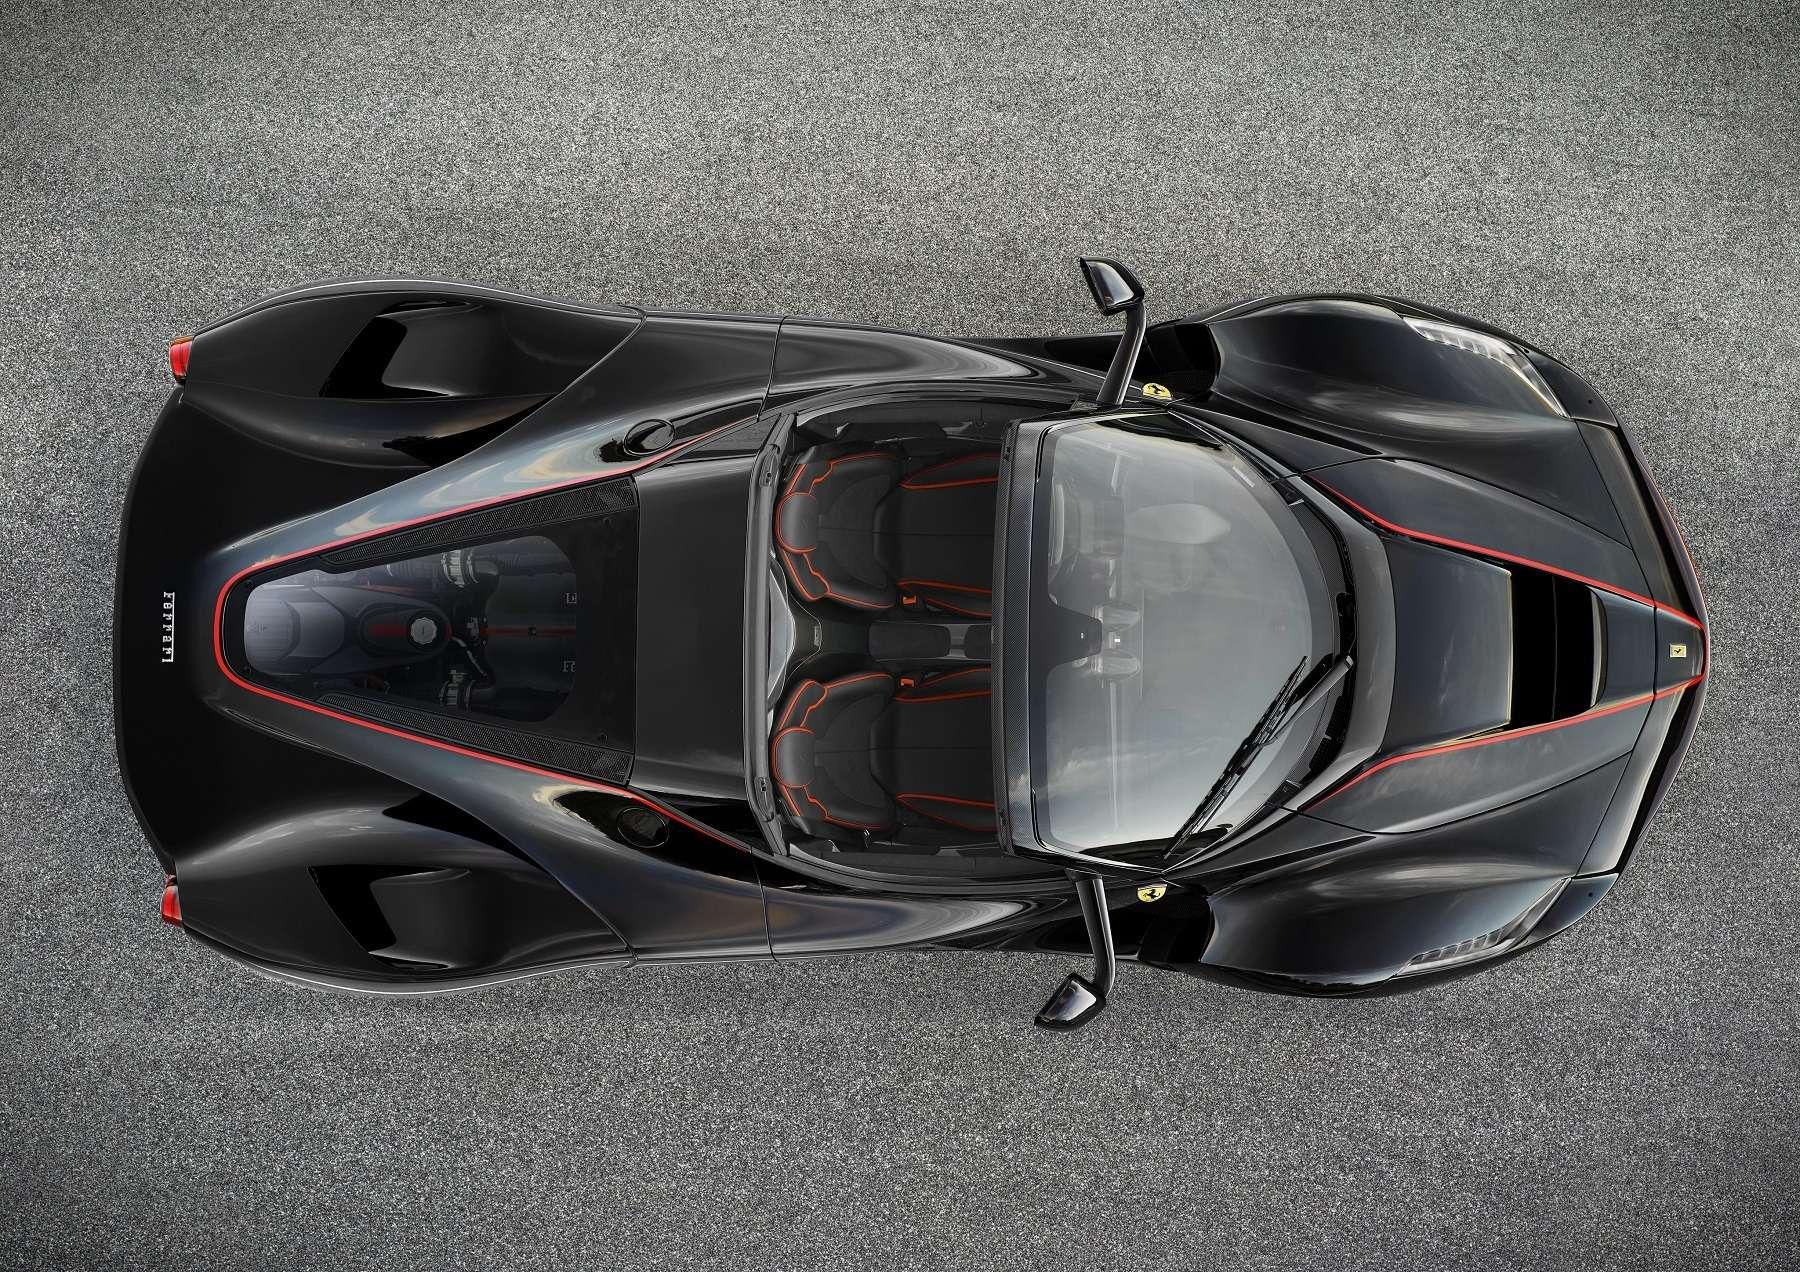 В двух словах овеликом: Ferrari представила гиперкар LaFerrari Aperta— фото 605419